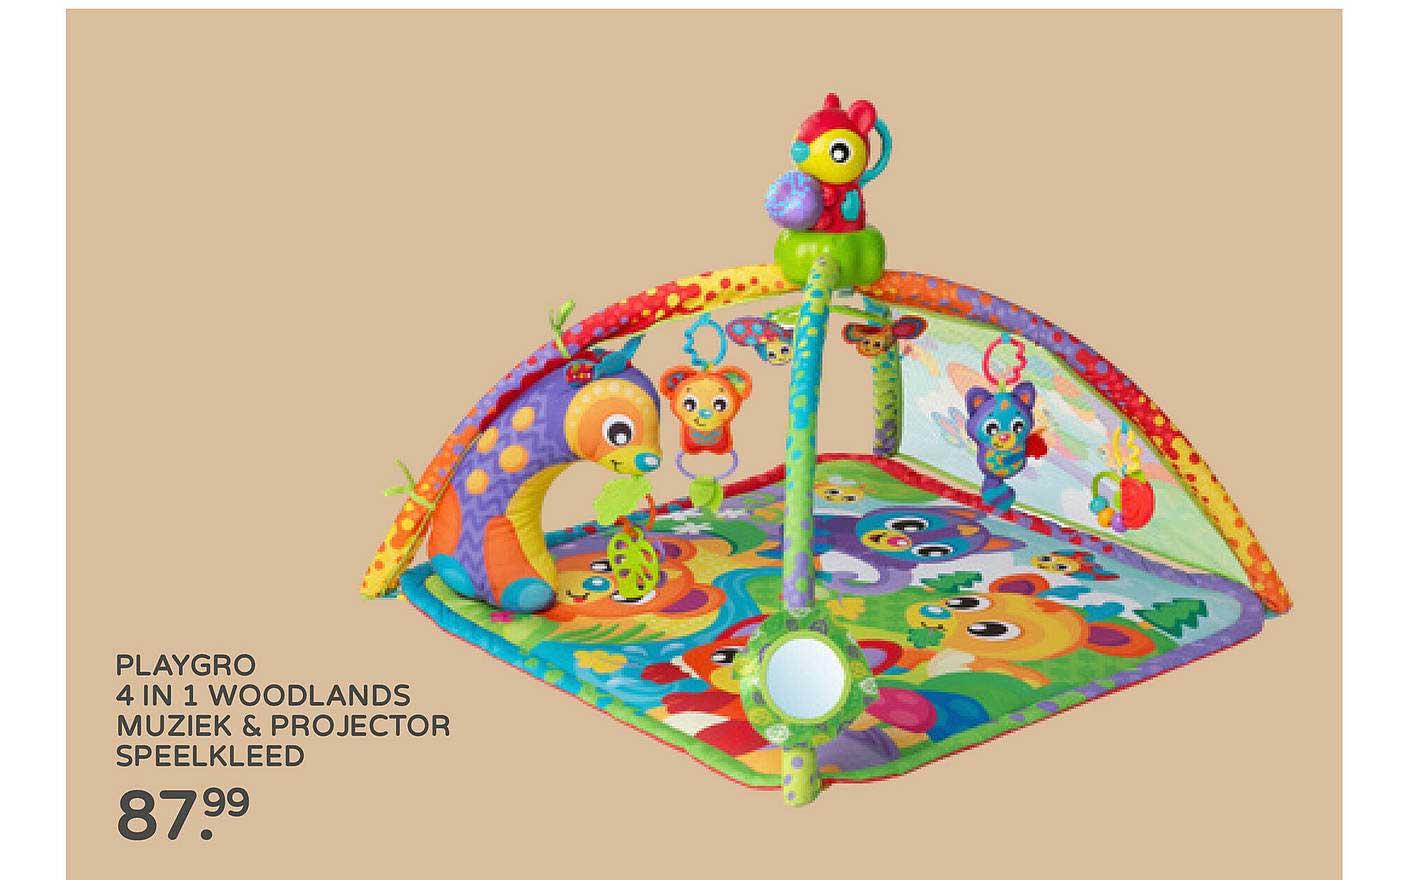 Prénatal Playgro 4 In 1 Woodlands Muziek & Projector Speelkleed